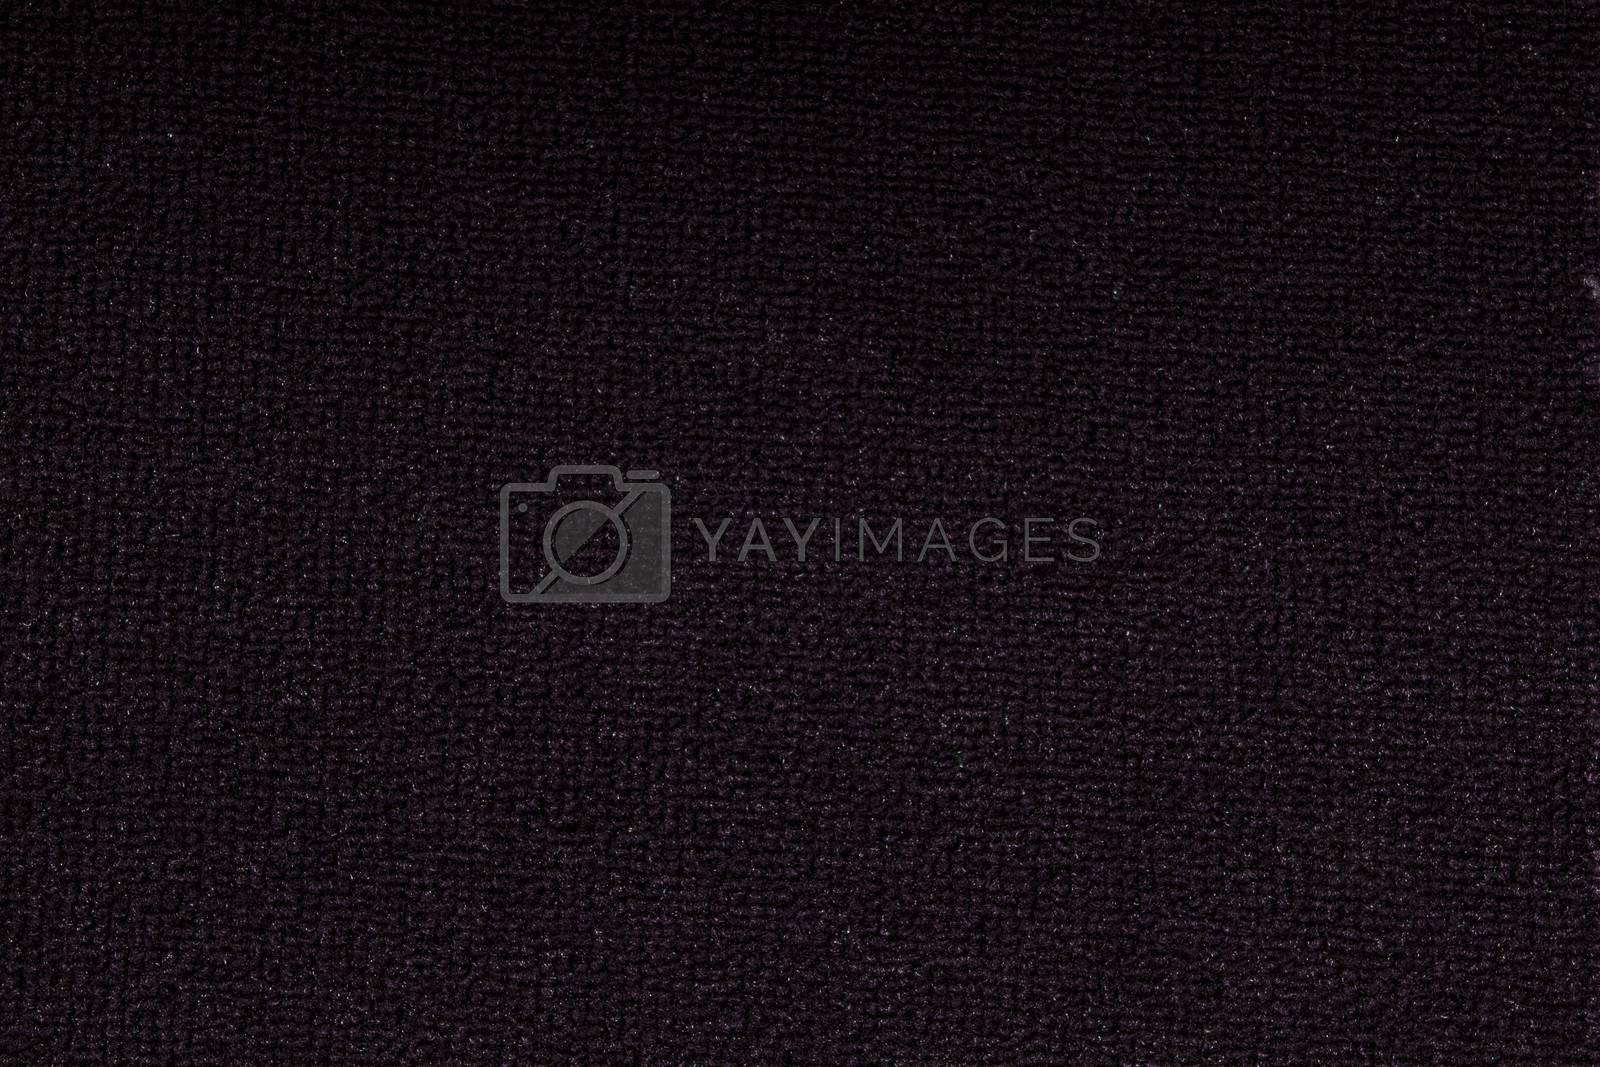 Background of black carpet closeup